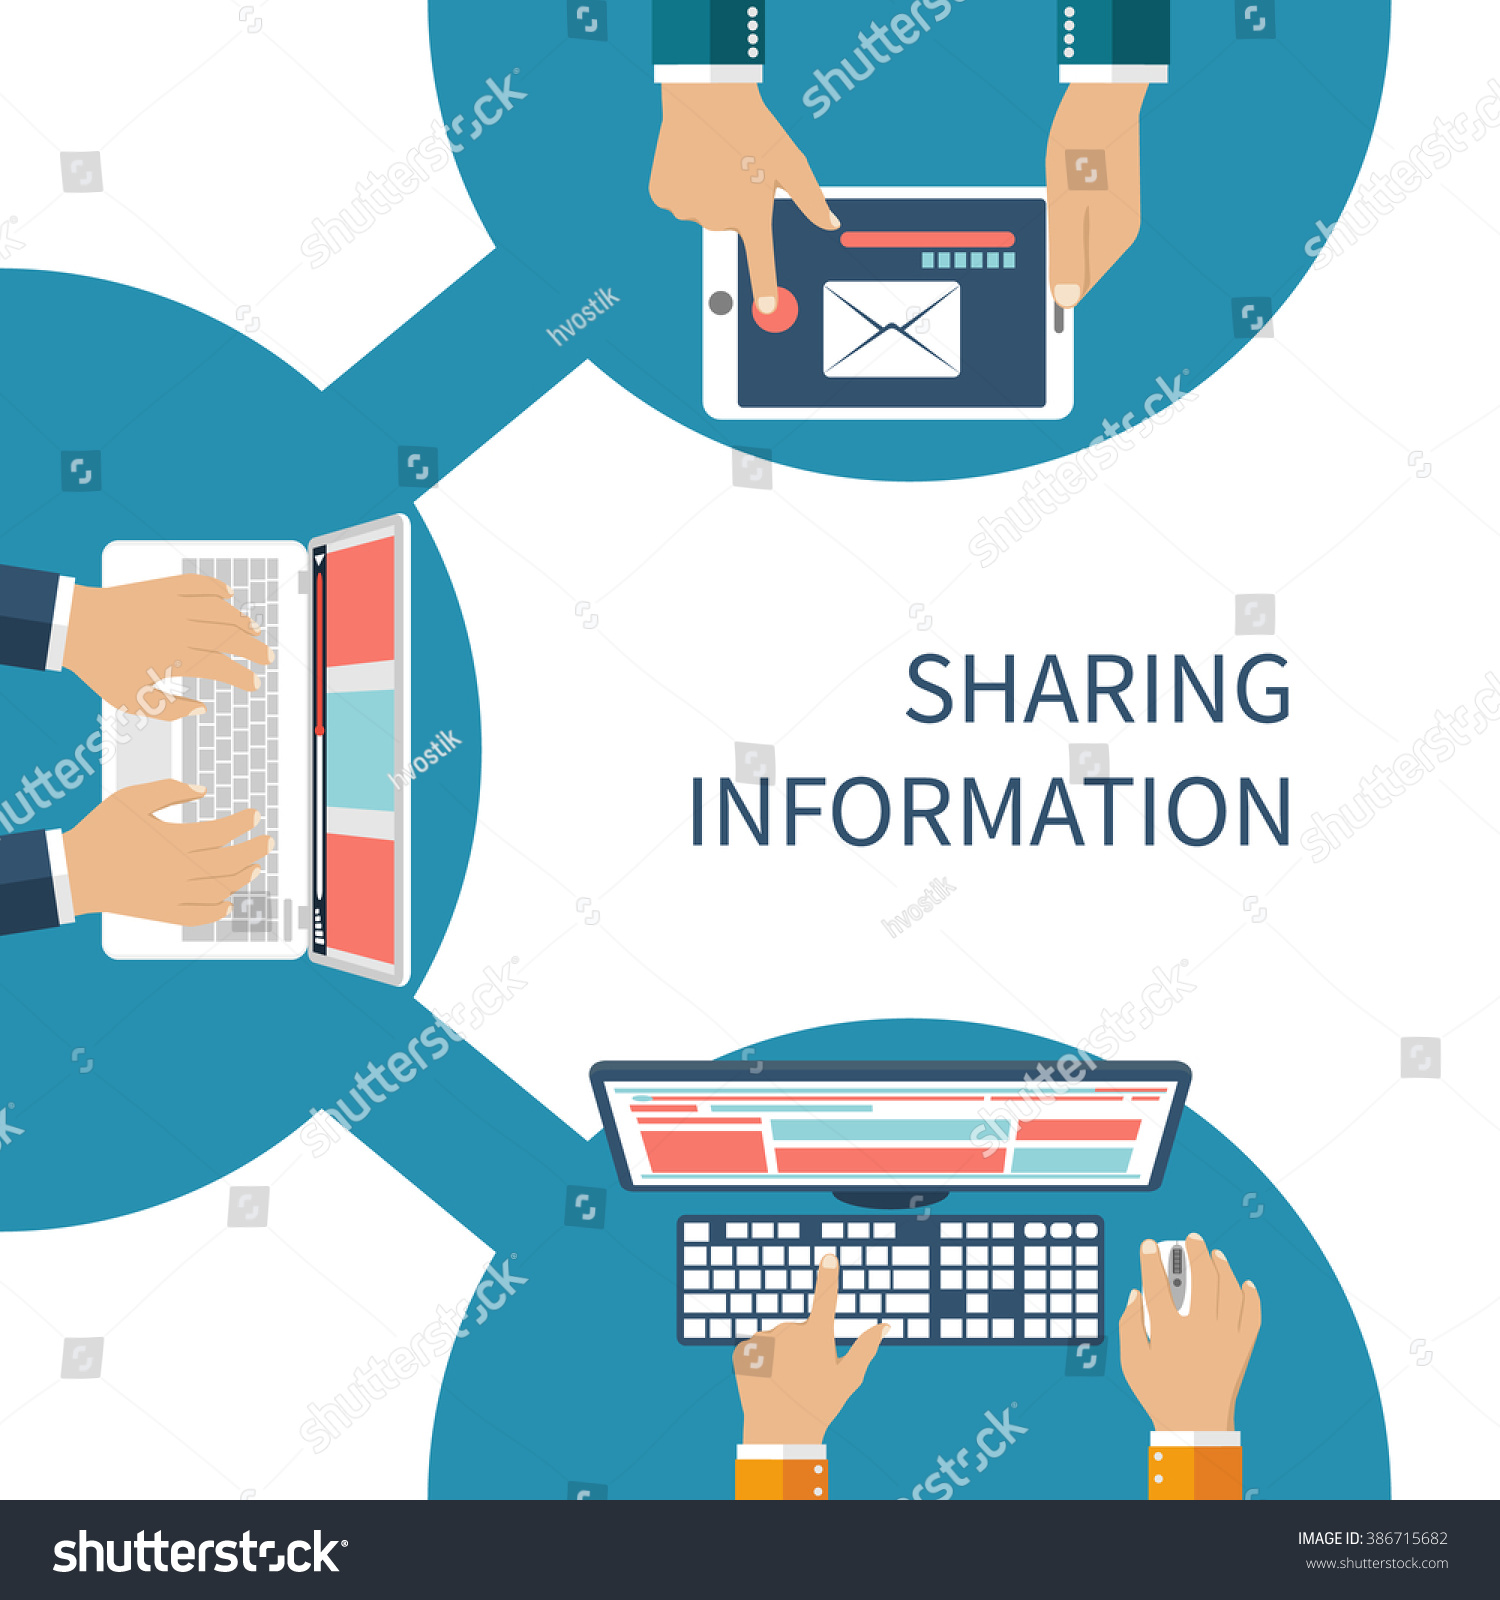 Sharing Information Concept Vector Social Network Stock ...